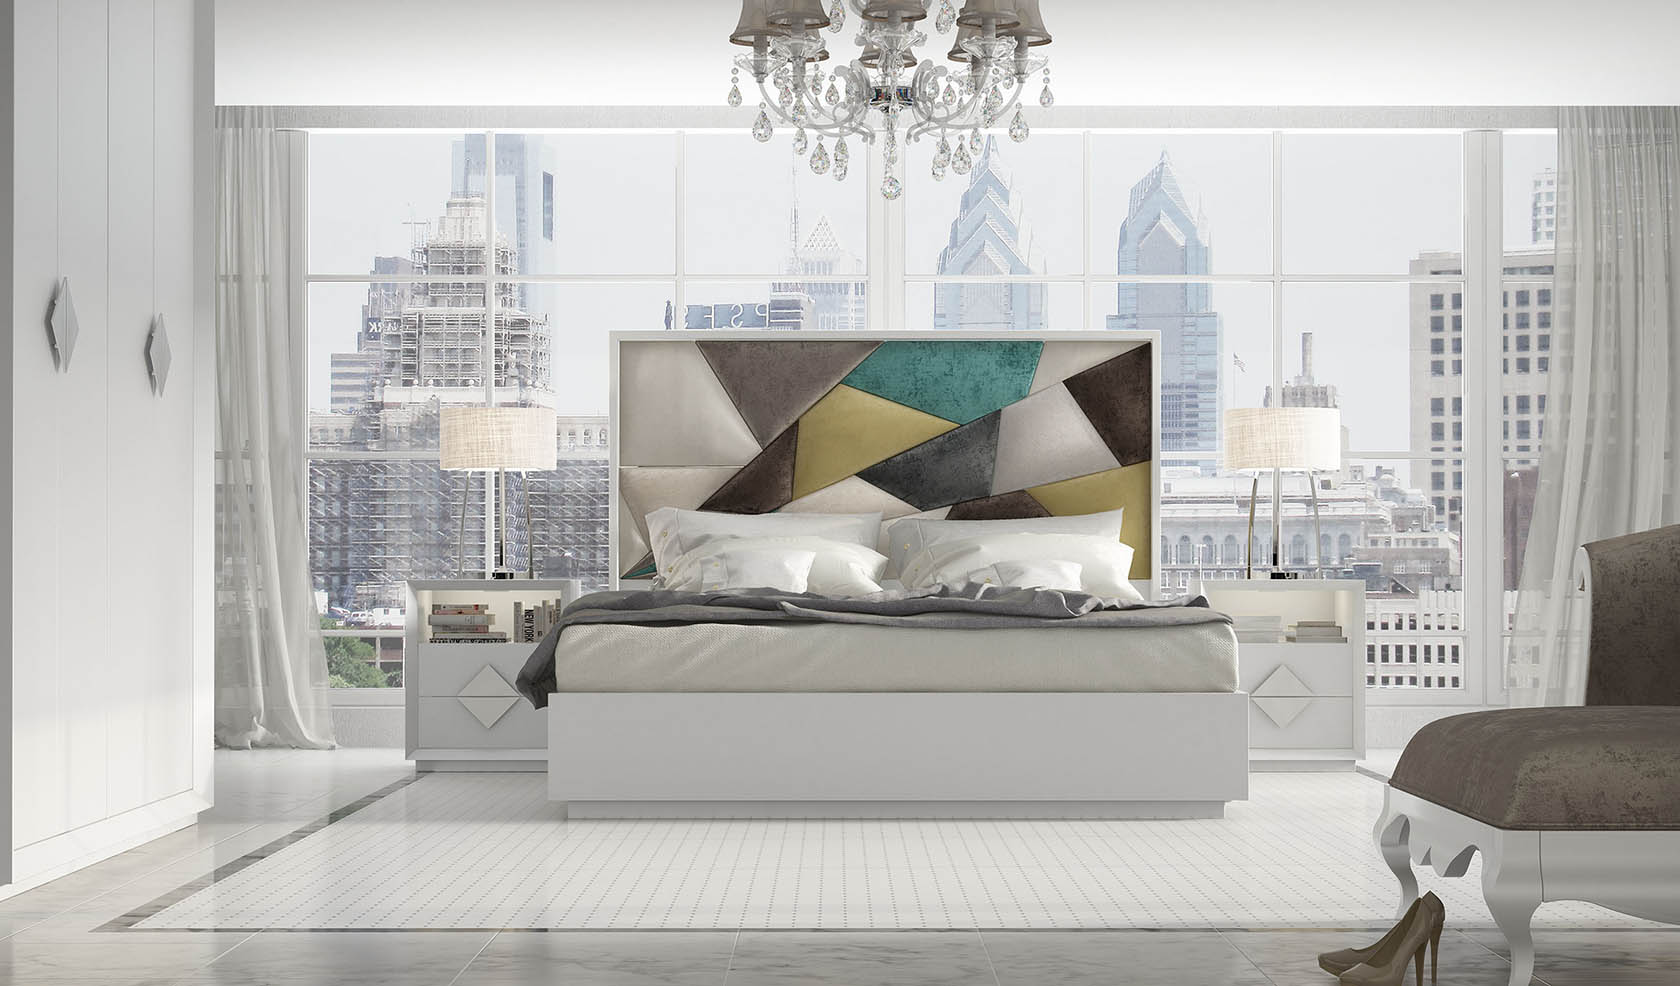 Dormitorio Franco Furniture con cabecero tapizado